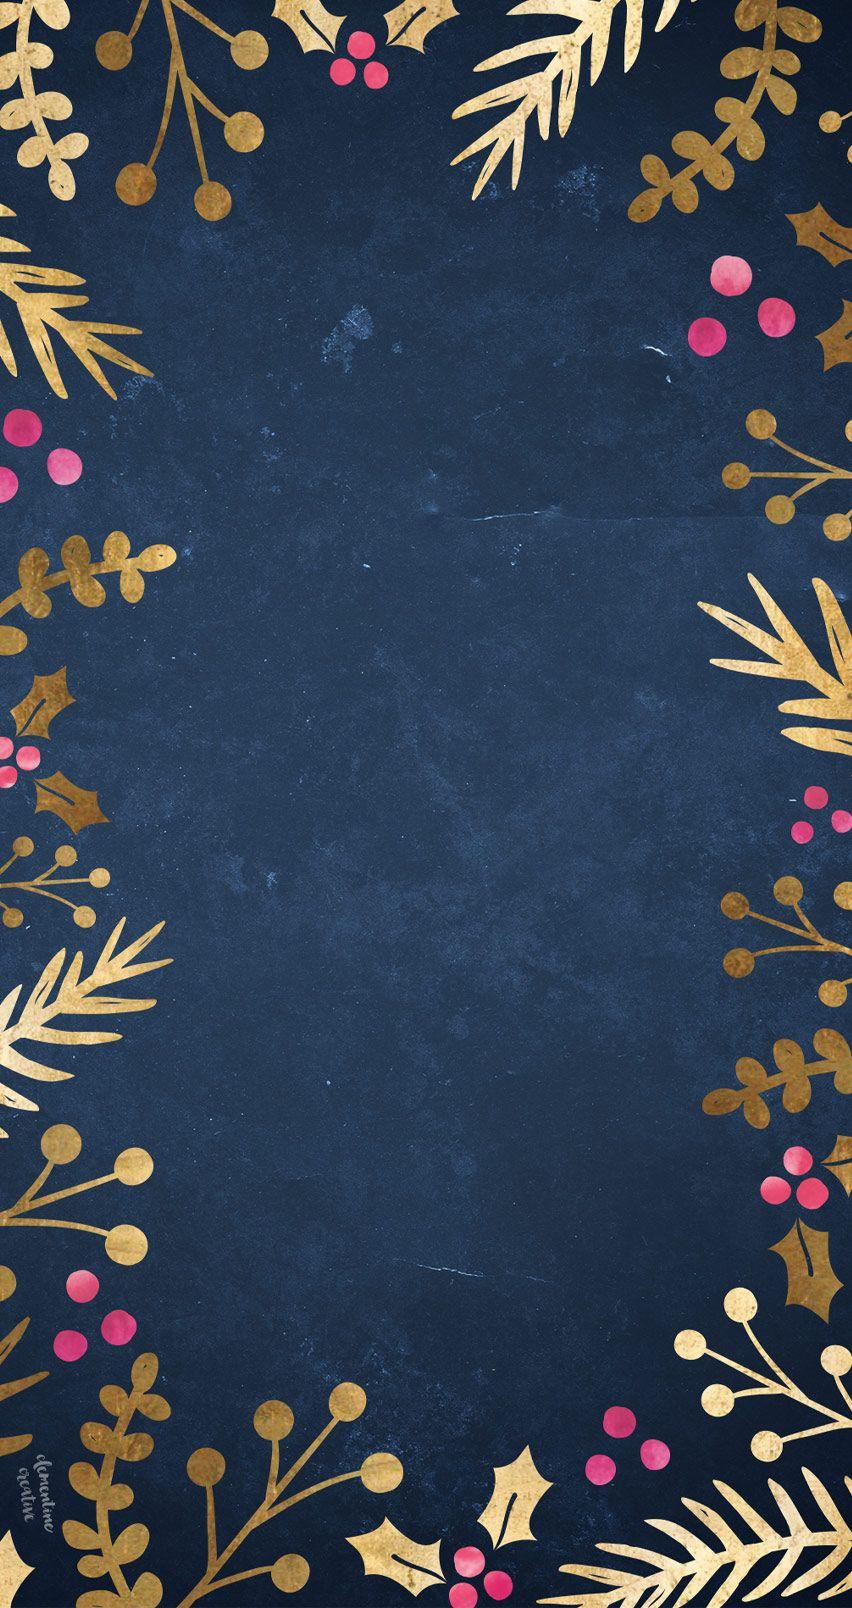 free festive wallpaper gold foil foliage weihnachtlich. Black Bedroom Furniture Sets. Home Design Ideas